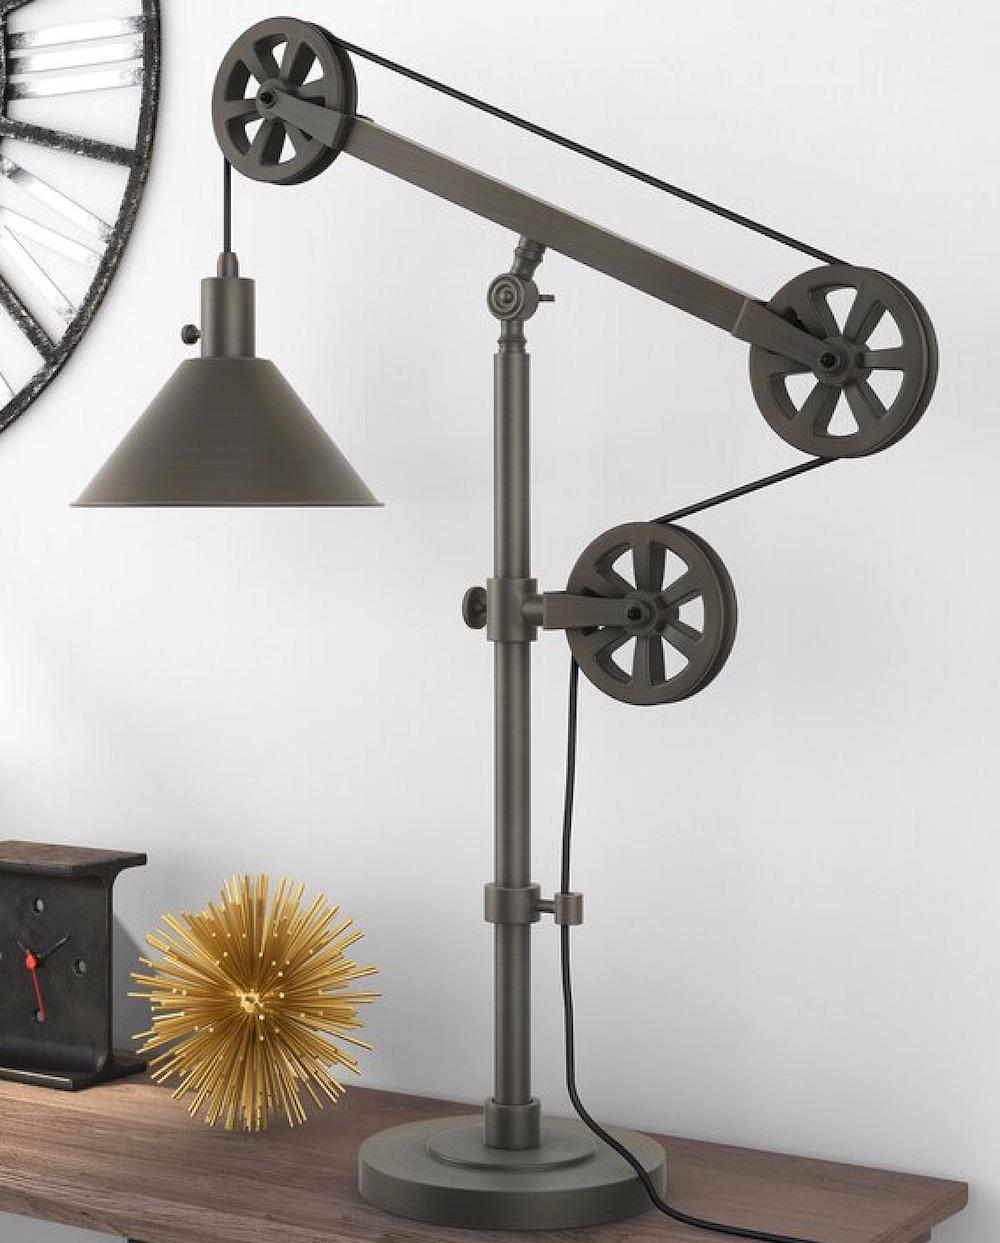 Industrial Desk Lamps for your Workspace Carlisle Desk Lamp